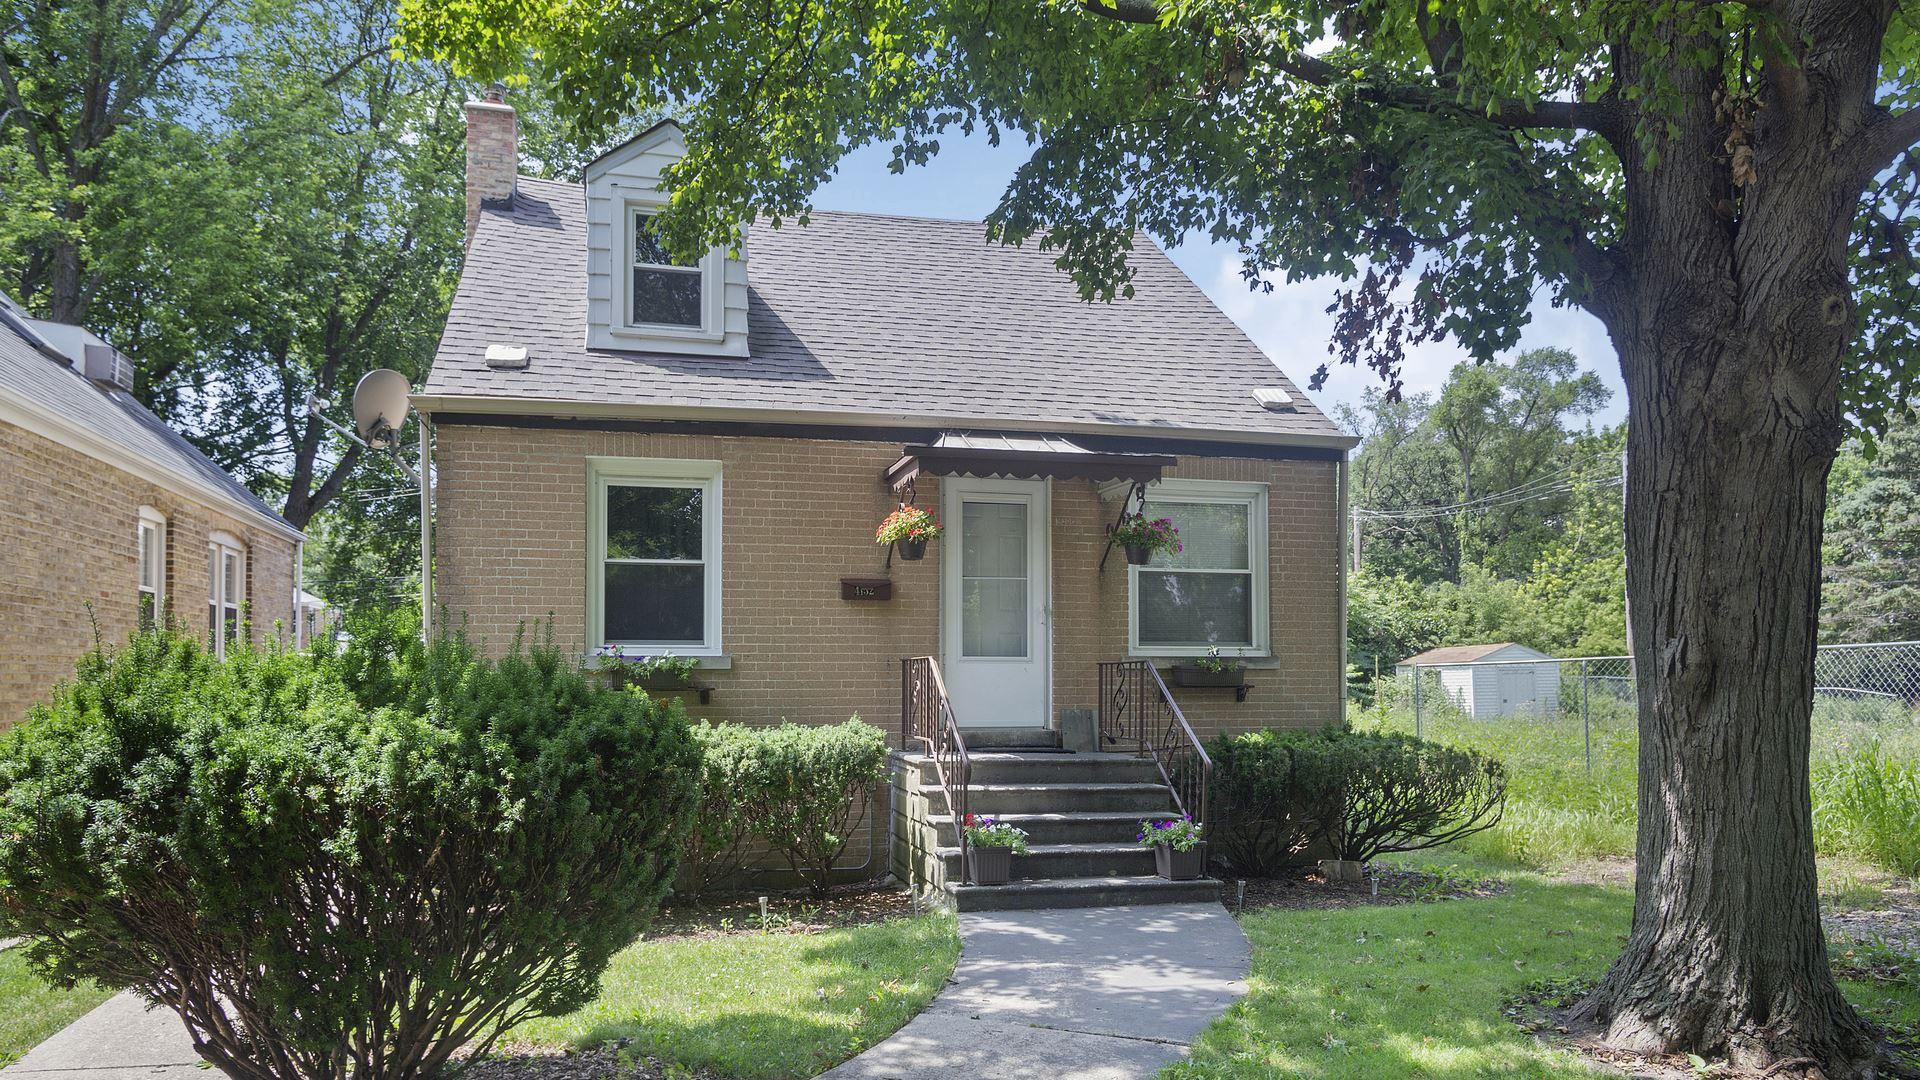 4152 N Pioneer Avenue, Chicago, IL 60634 - #: 10804031